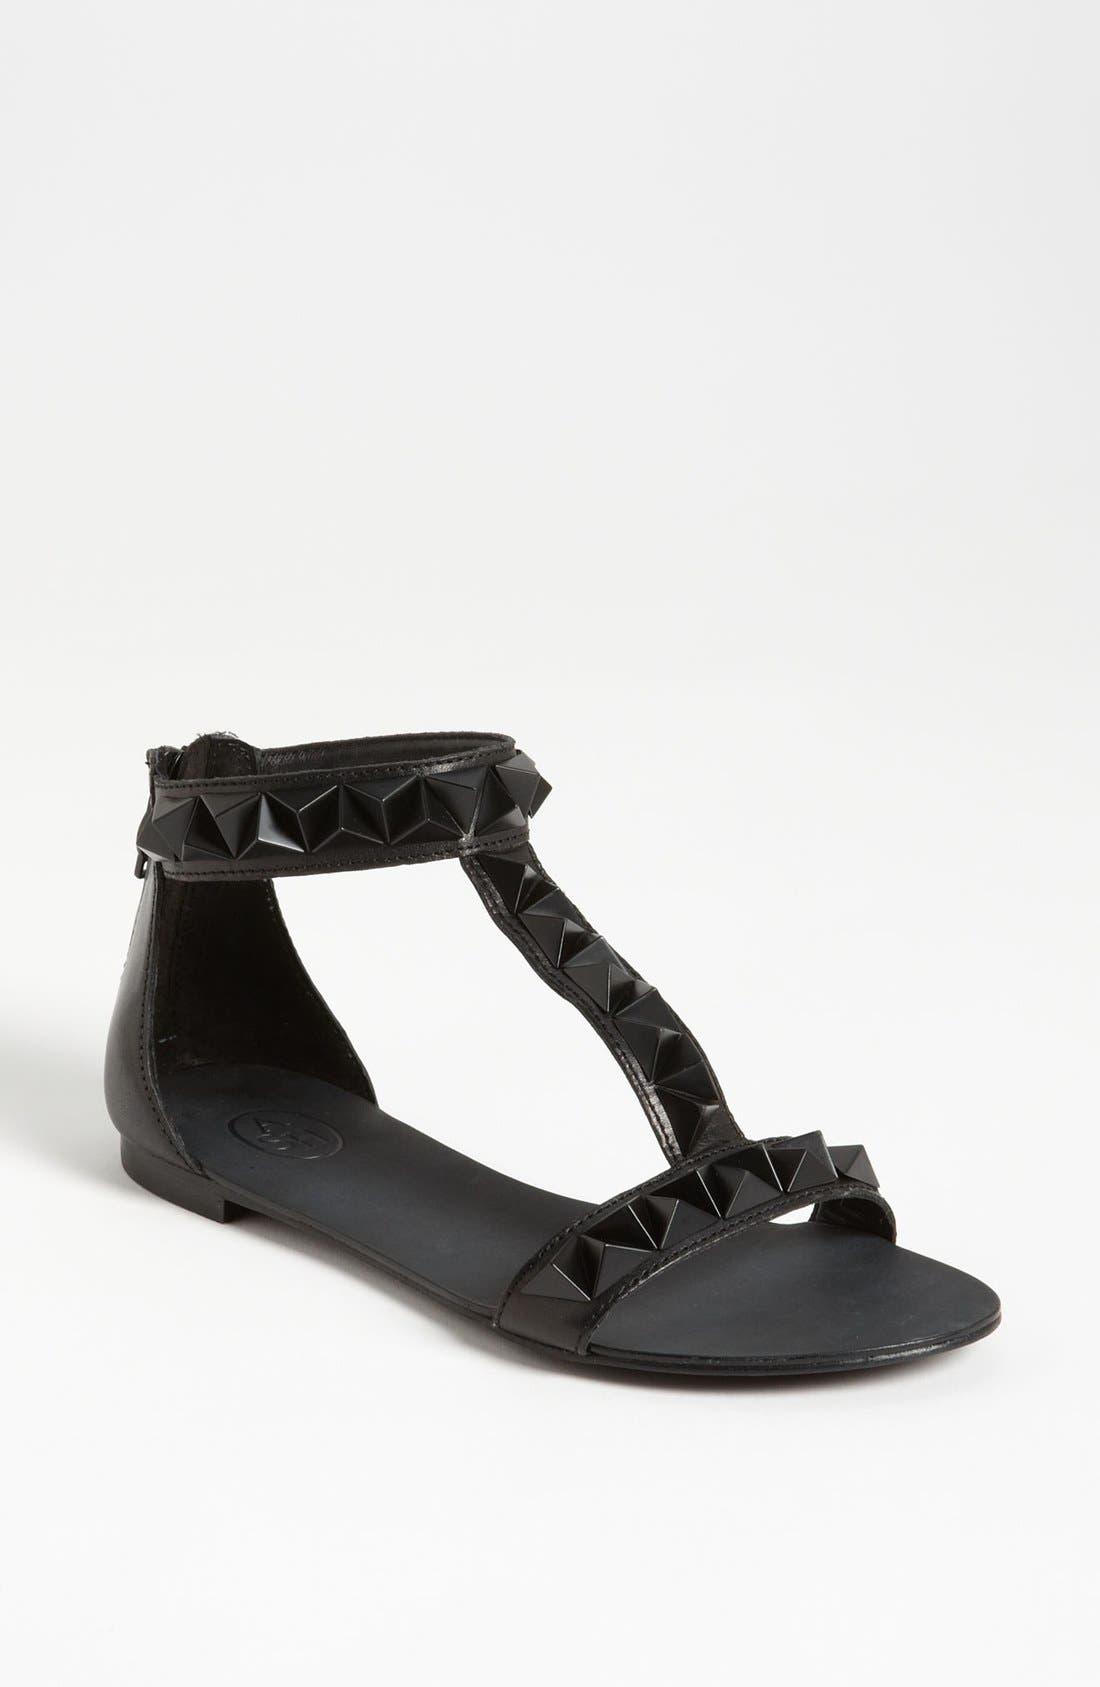 Alternate Image 1 Selected - Ash 'Mosaic Bis' Sandal